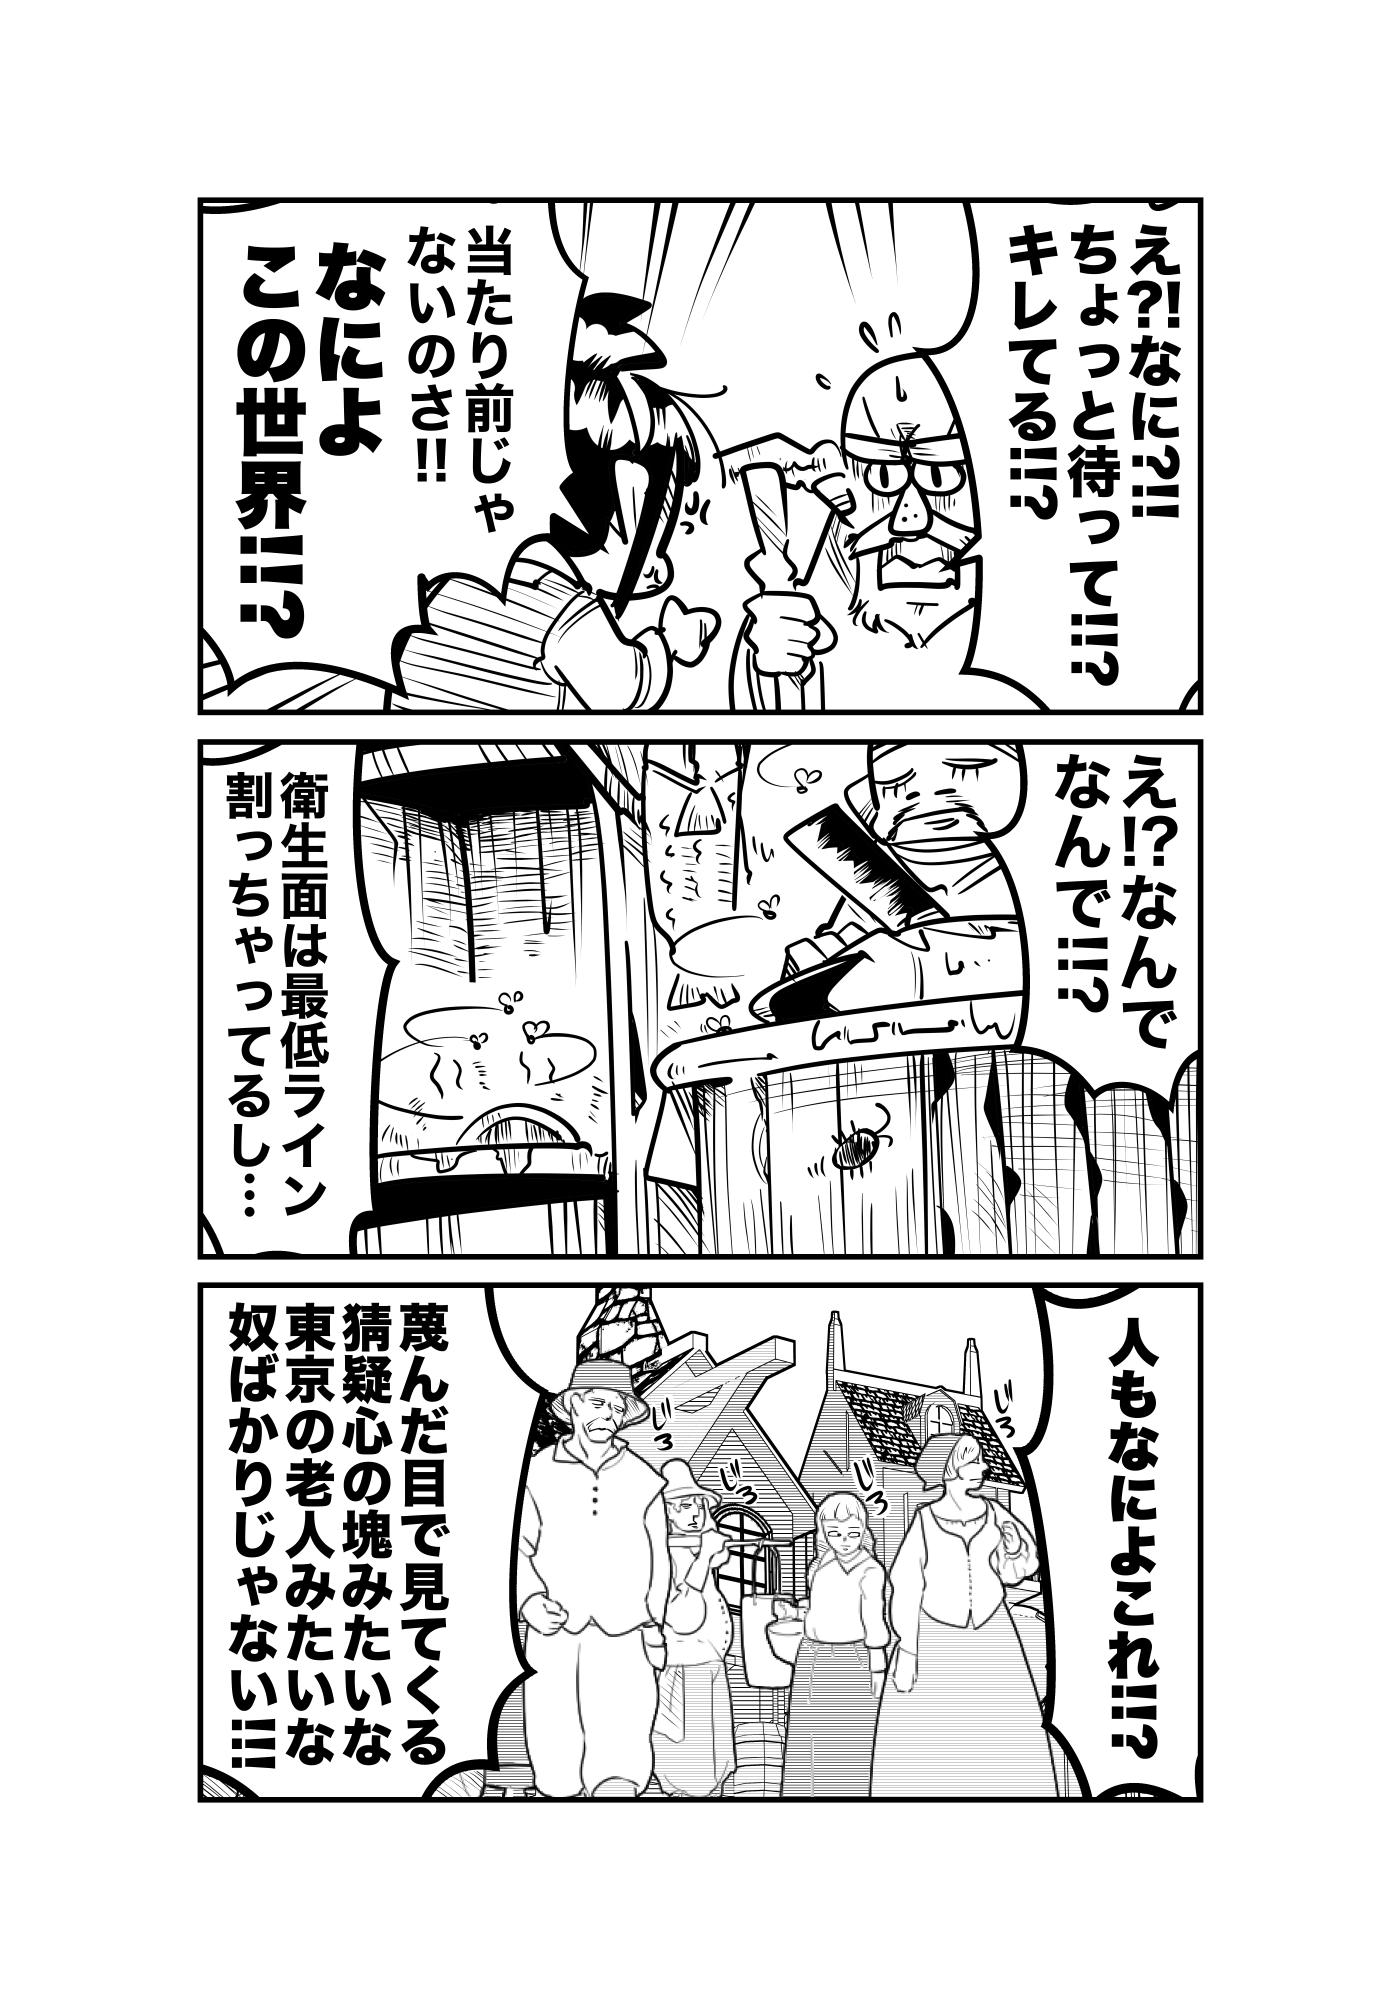 f:id:terashimaru117:20210910131726p:plain